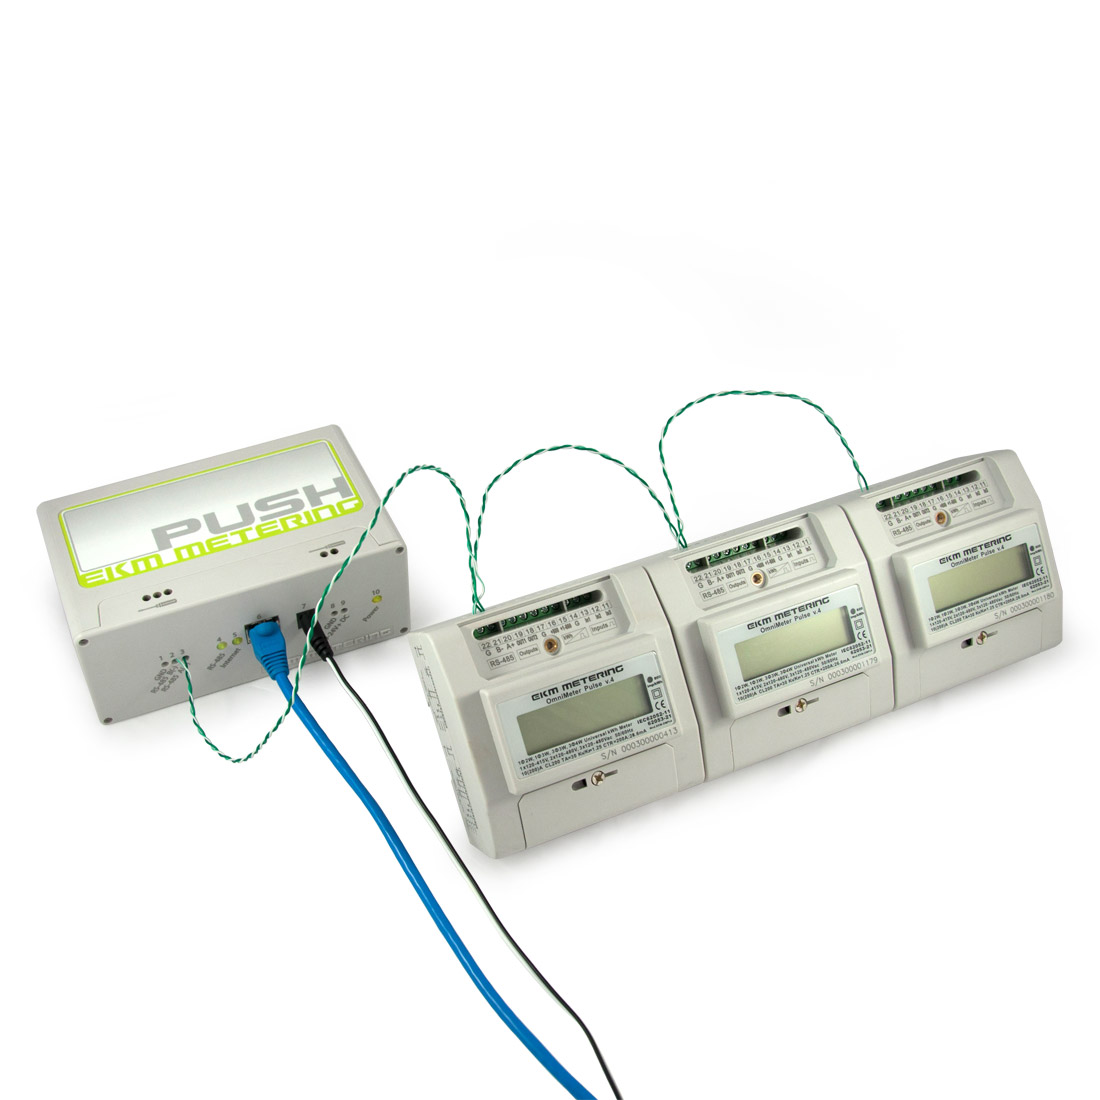 best practices if your power wires  [ 1100 x 1100 Pixel ]